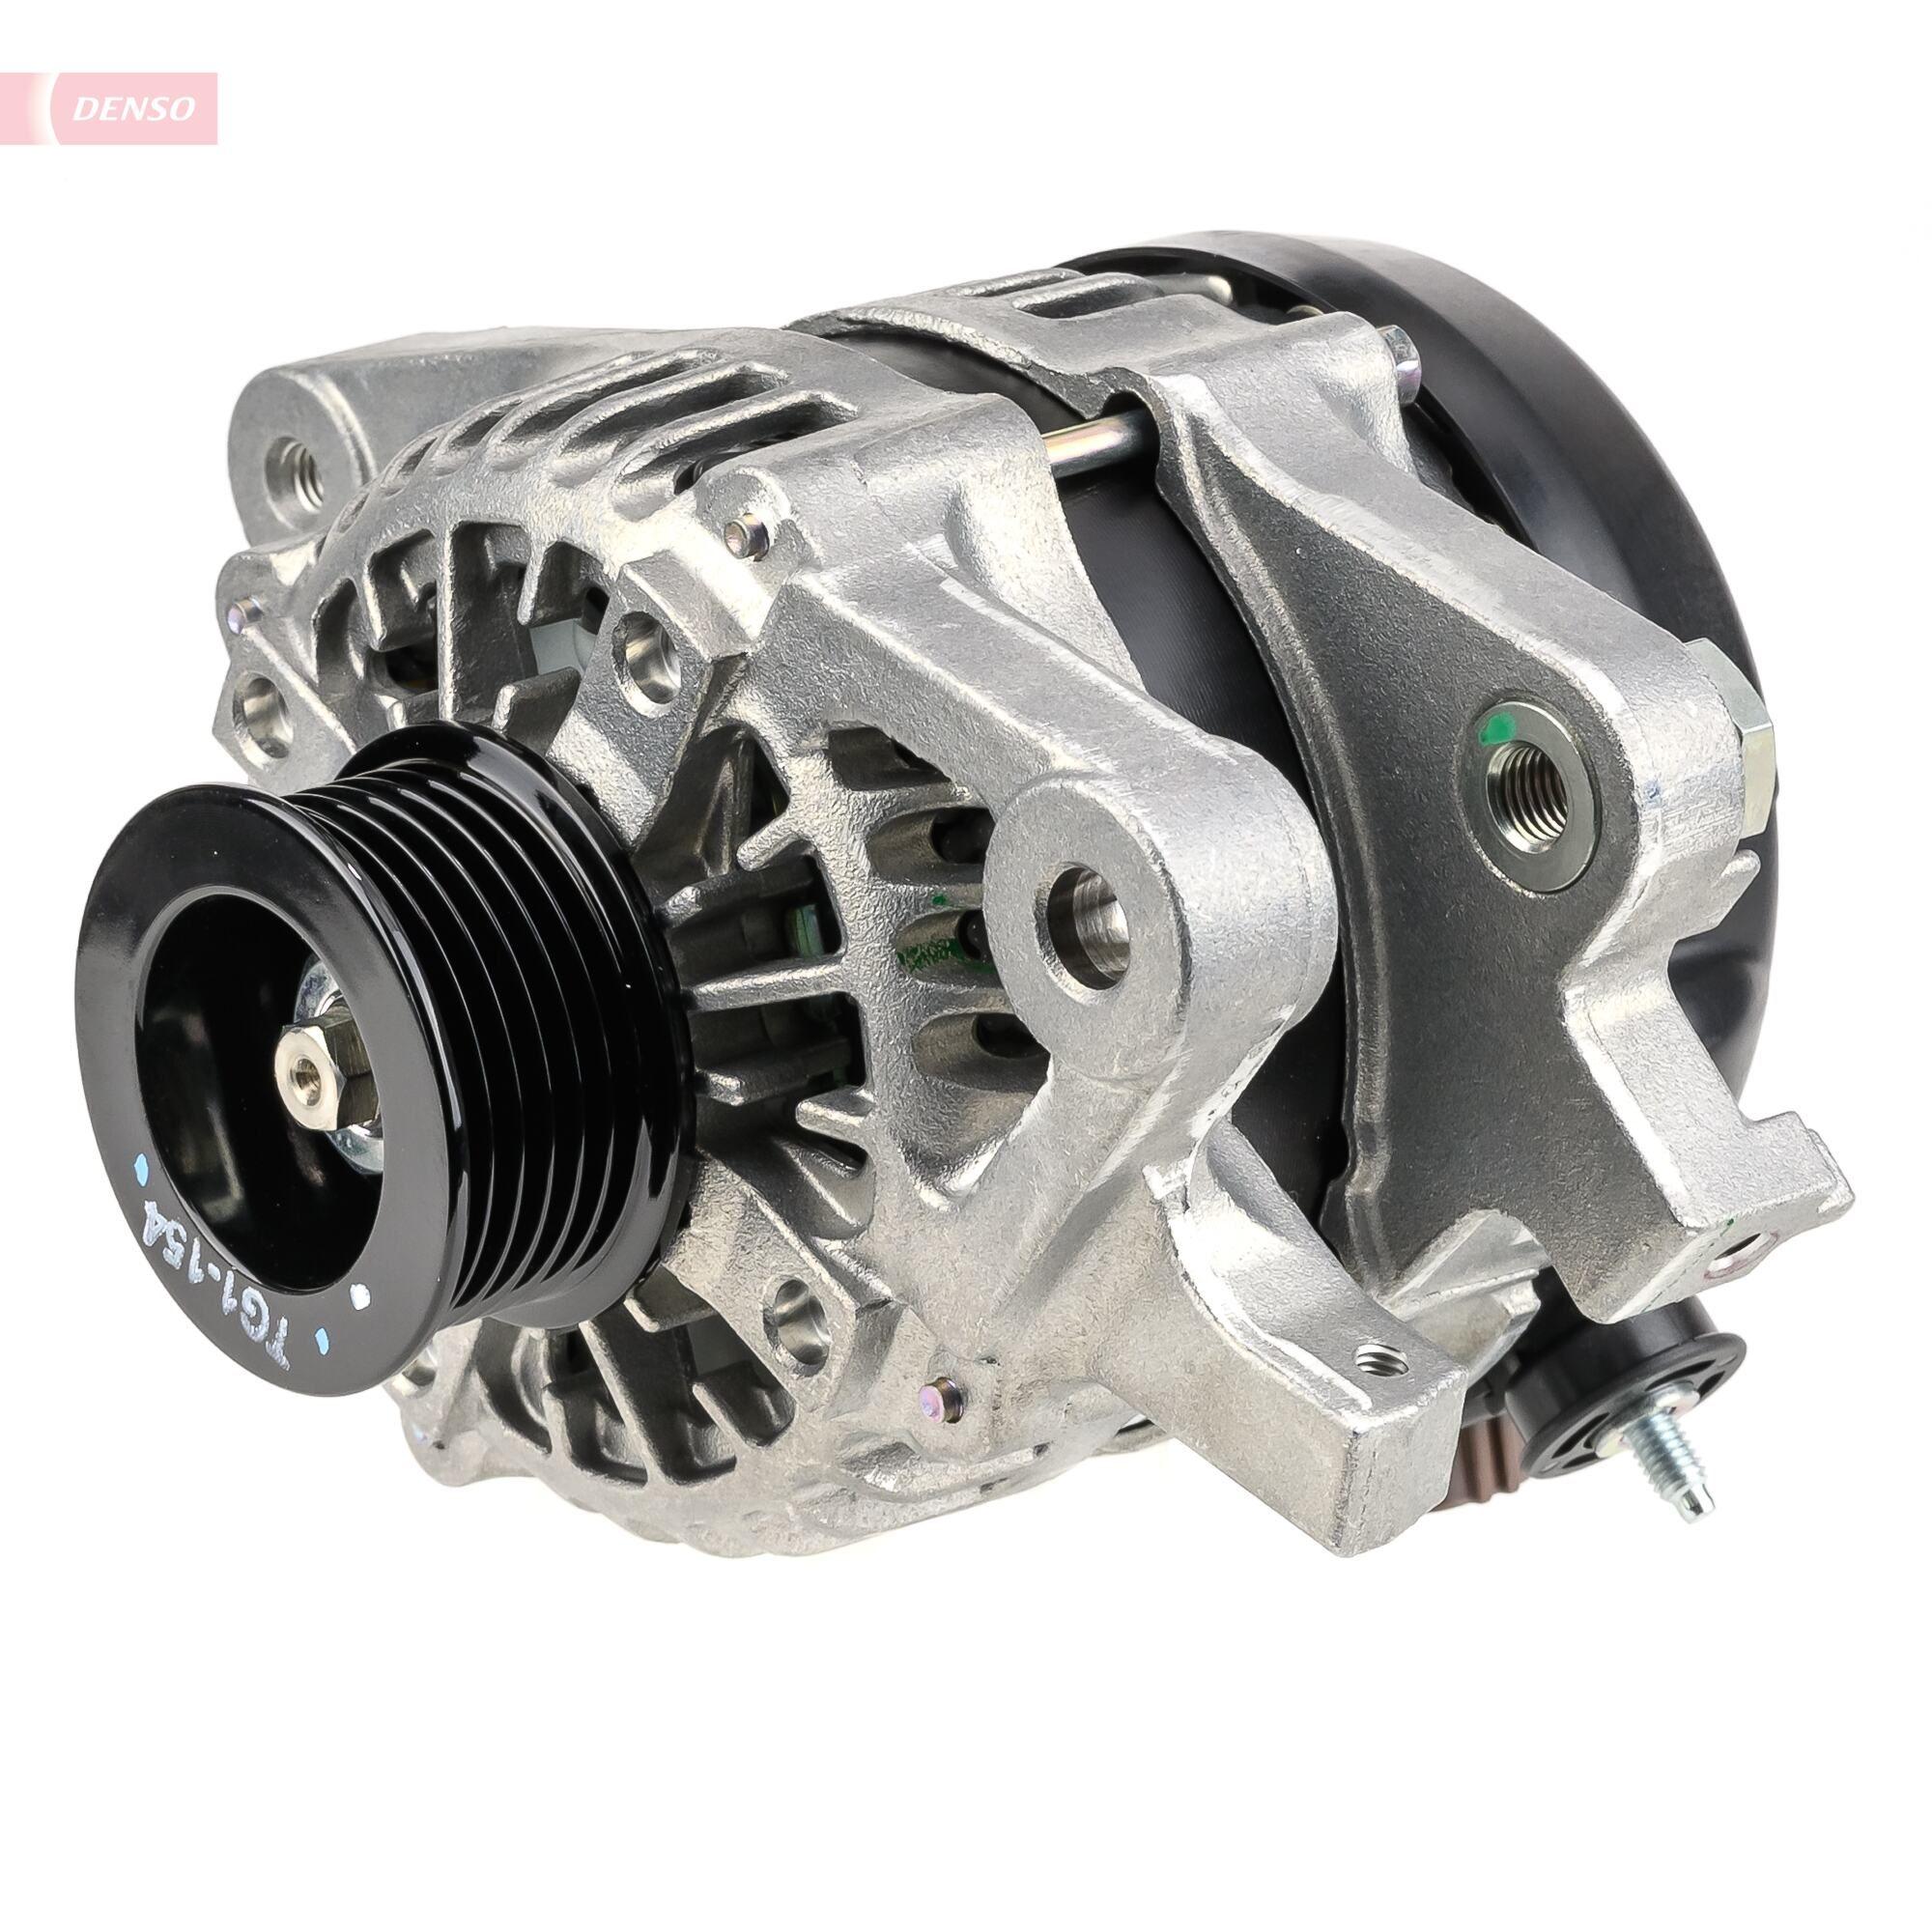 Generador DAN1042 DENSO DAN1042 en calidad original